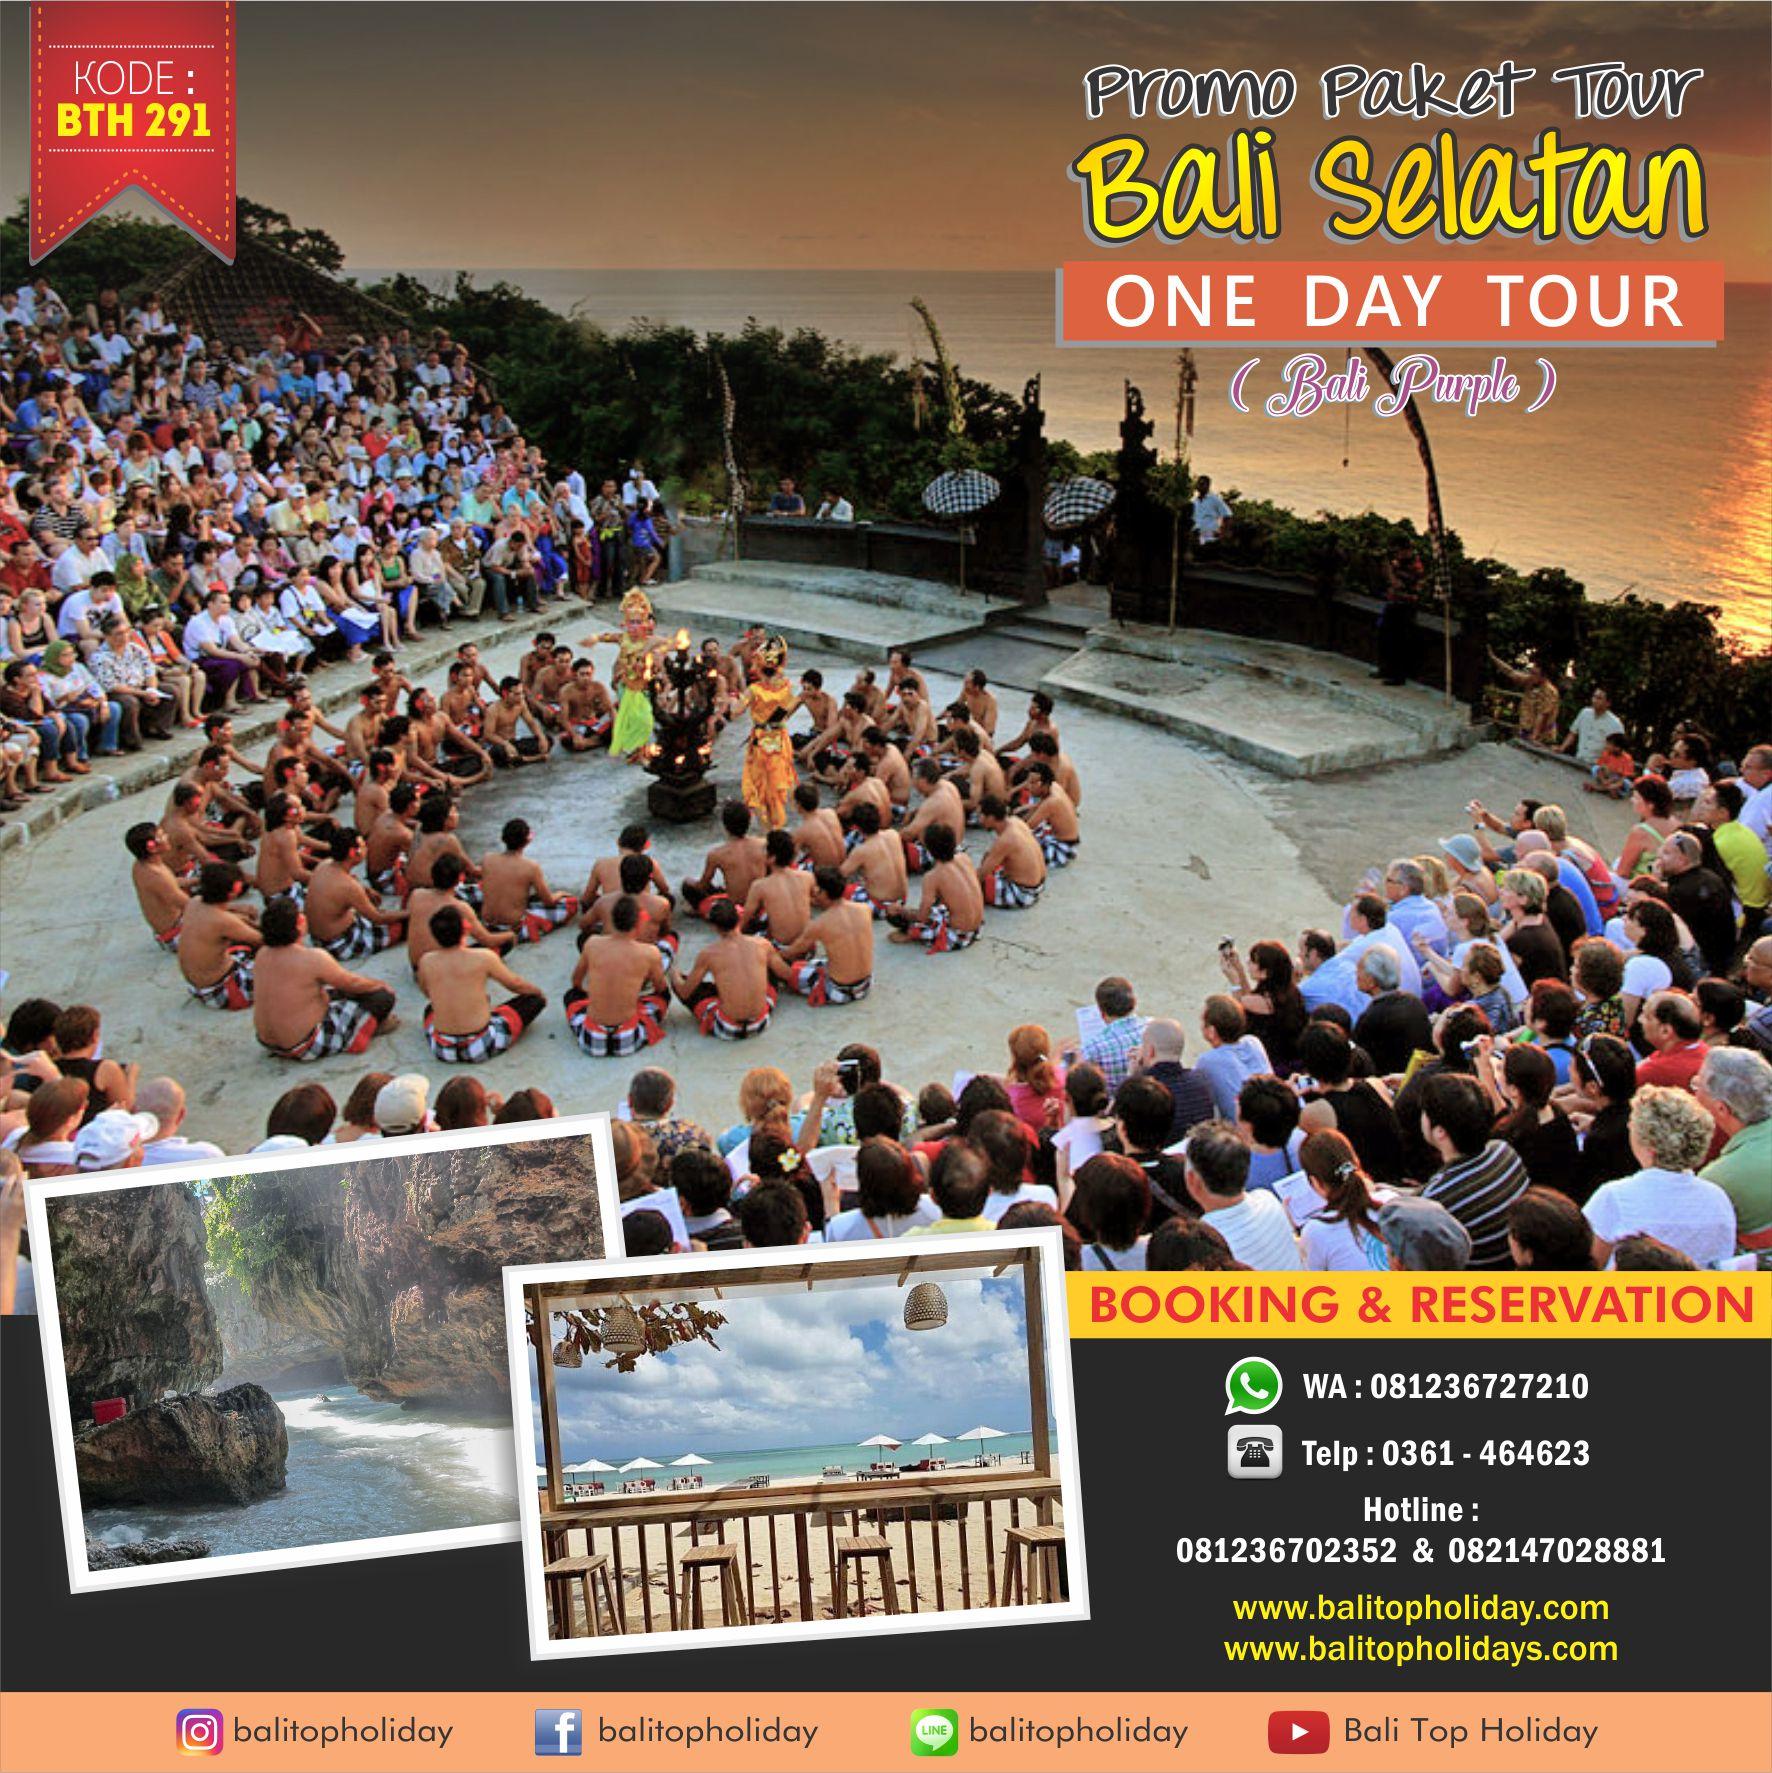 paket tour Bali Selatan 1 hari